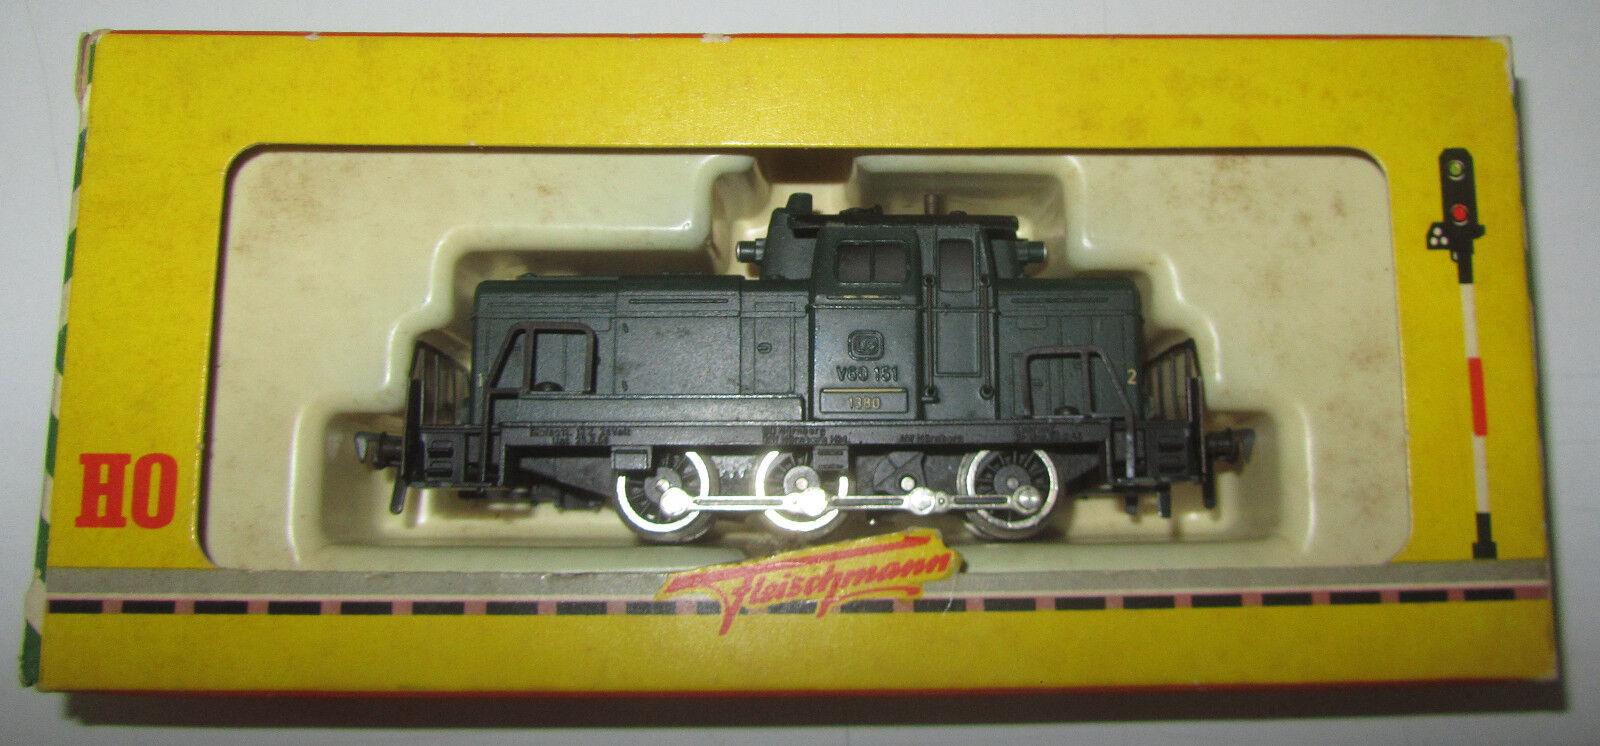 Locomotiva Fleischmann DB V60 151 art. 1380 F in box SPESE GRATIS